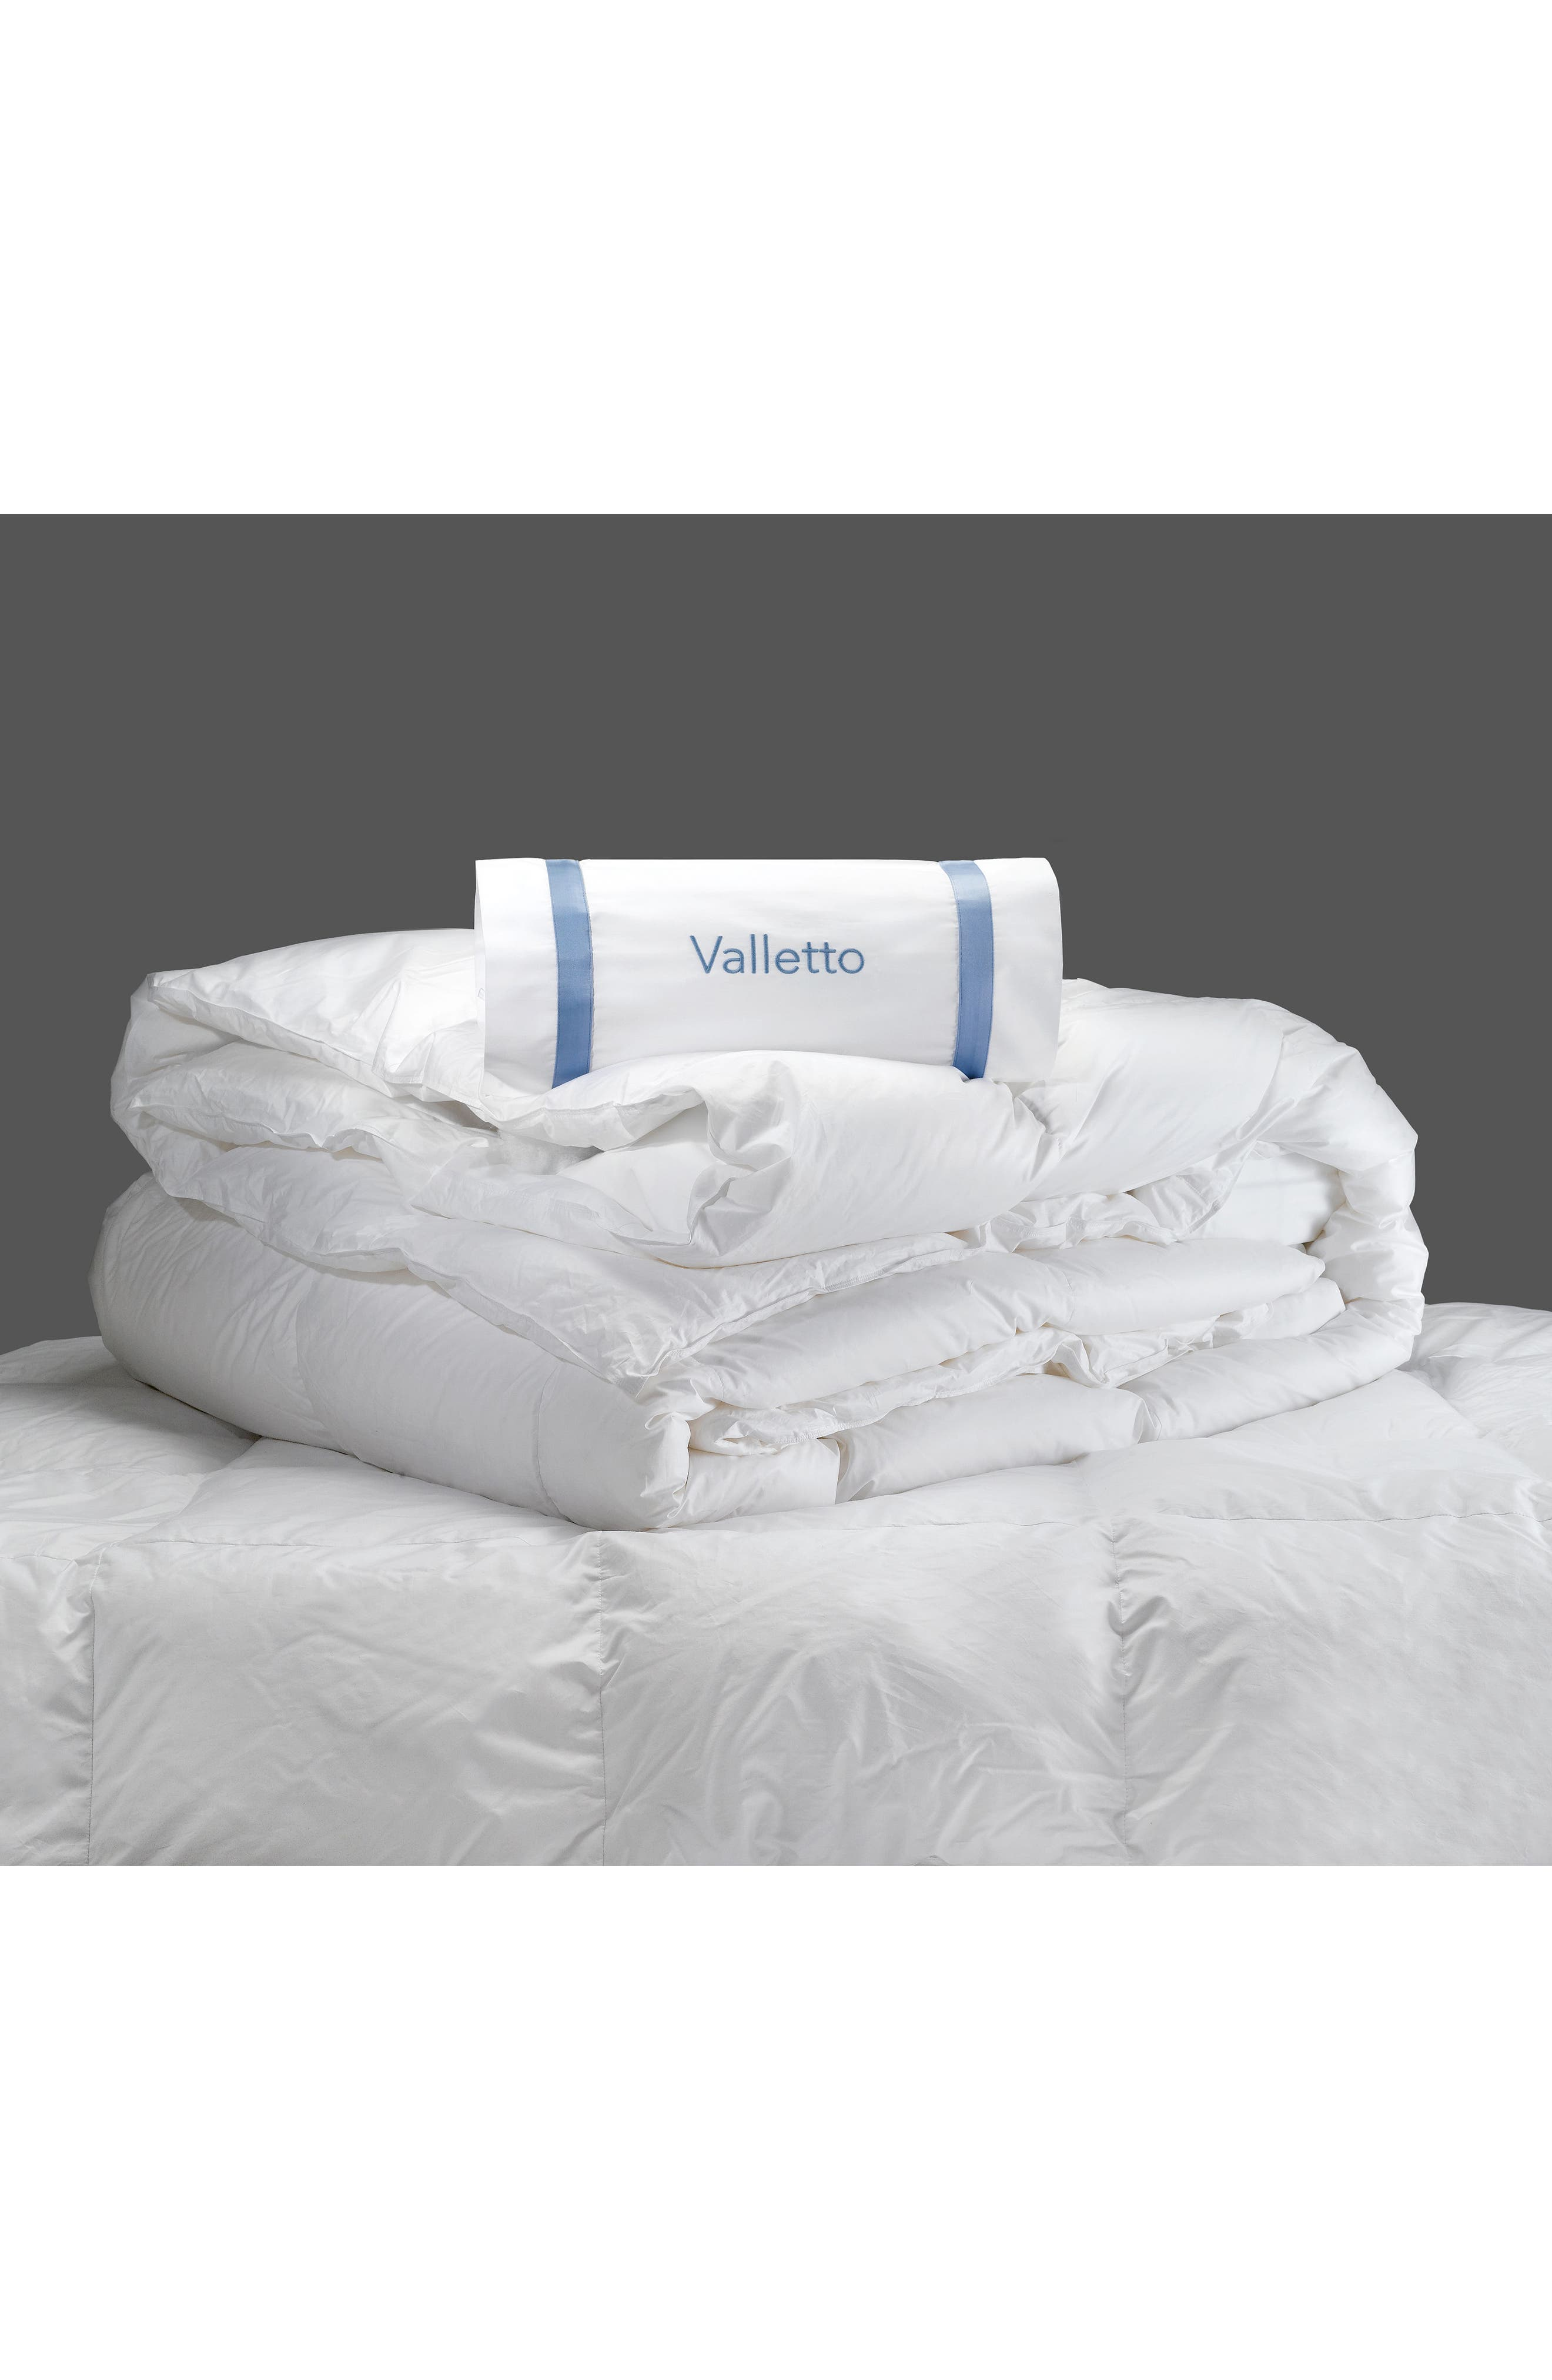 Alternate Image 2  - Matouk Valletto 650 Fill Power Winter Down Comforter